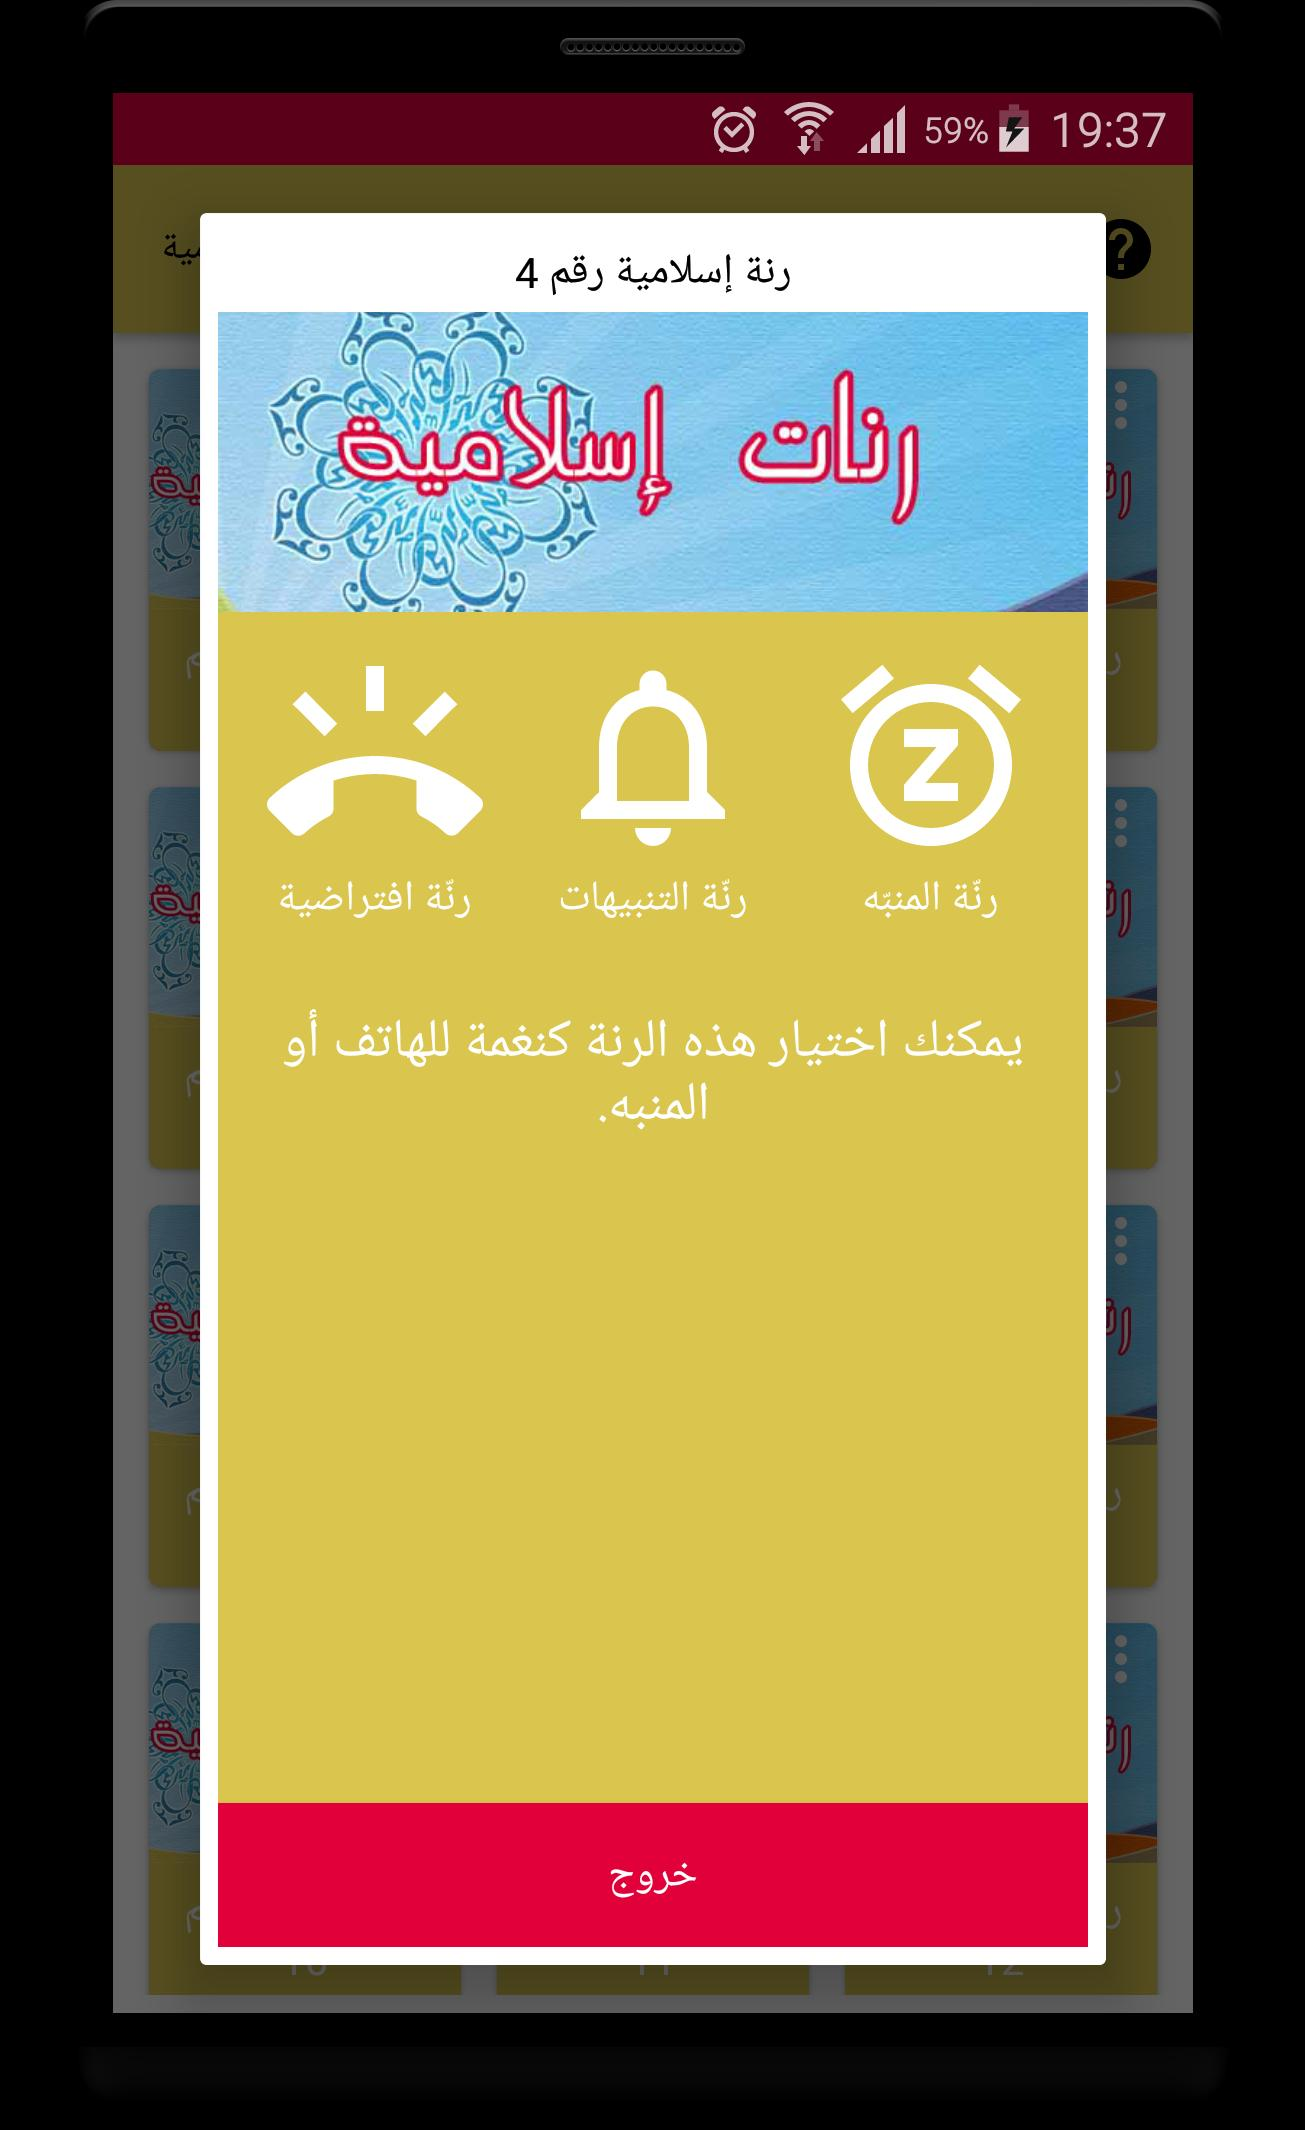 همسات طلع البدر علينا for Android - APK Download